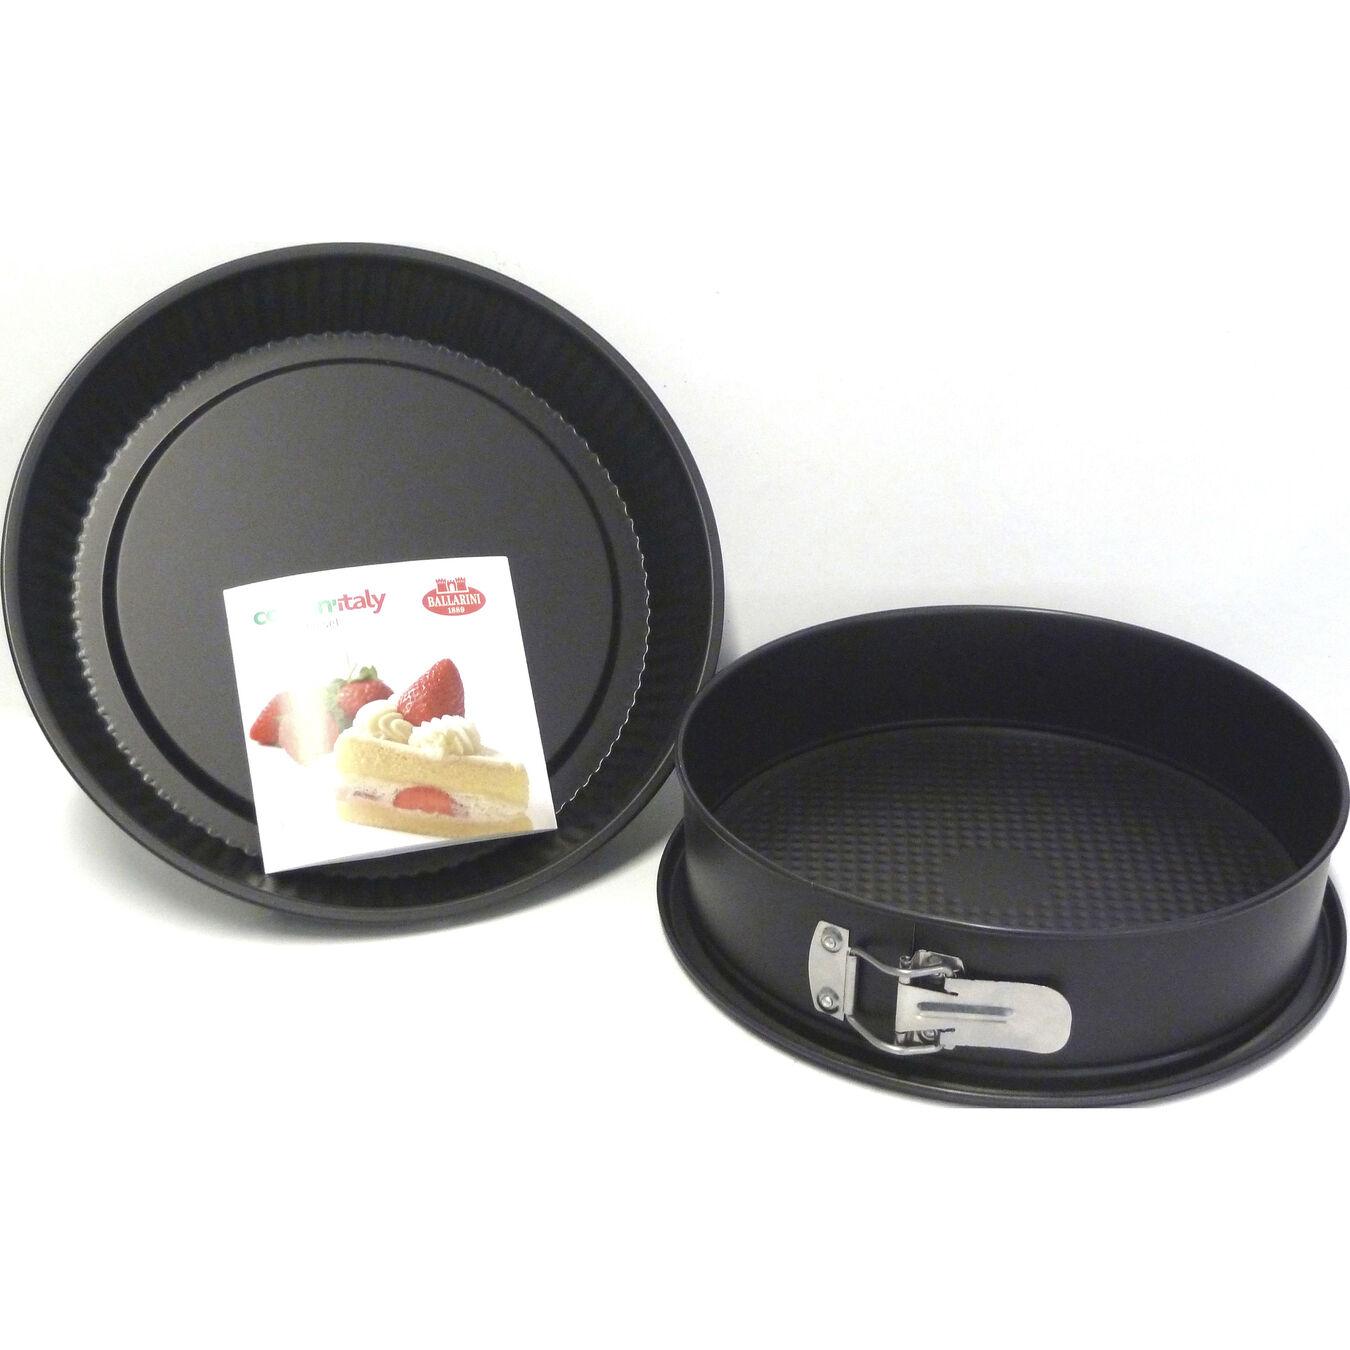 3 Piece round Bakeware set, black,,large 1